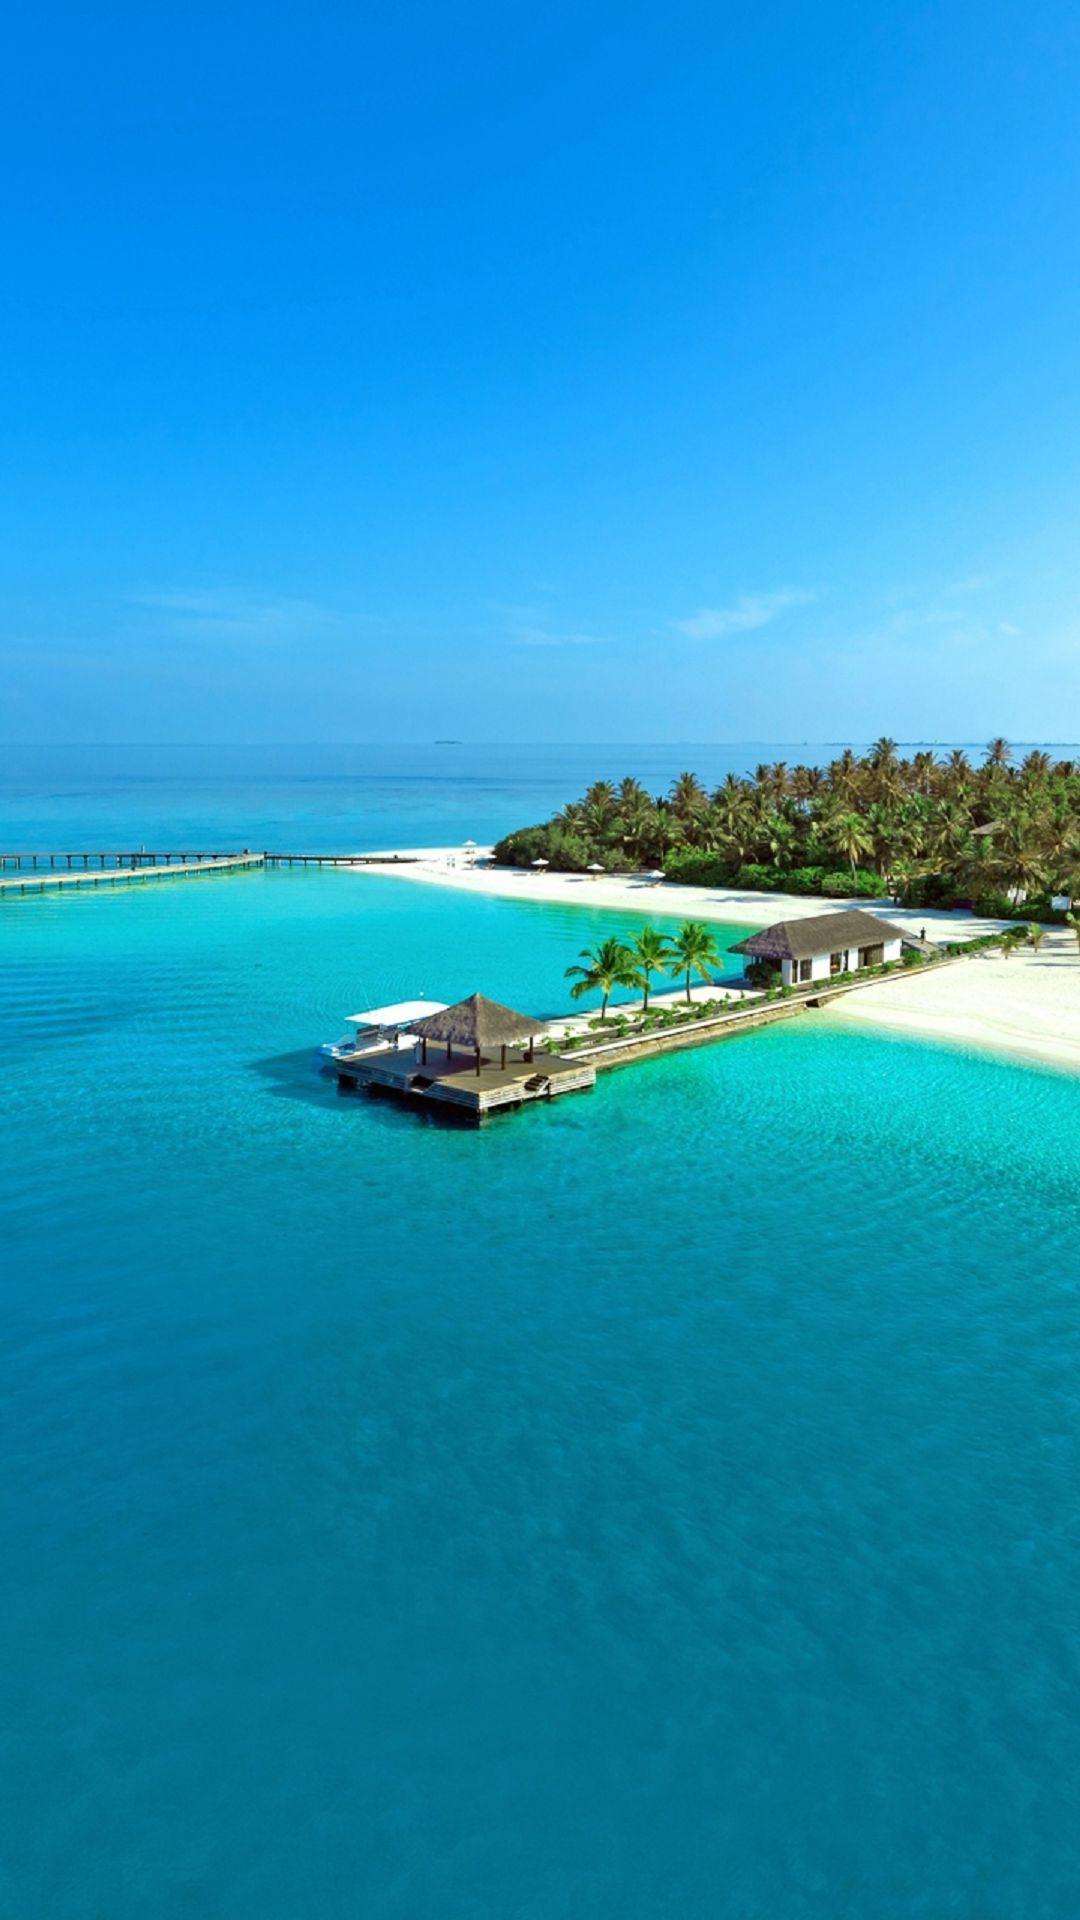 20 most beautiful islands in the world | maldives, maldives resort